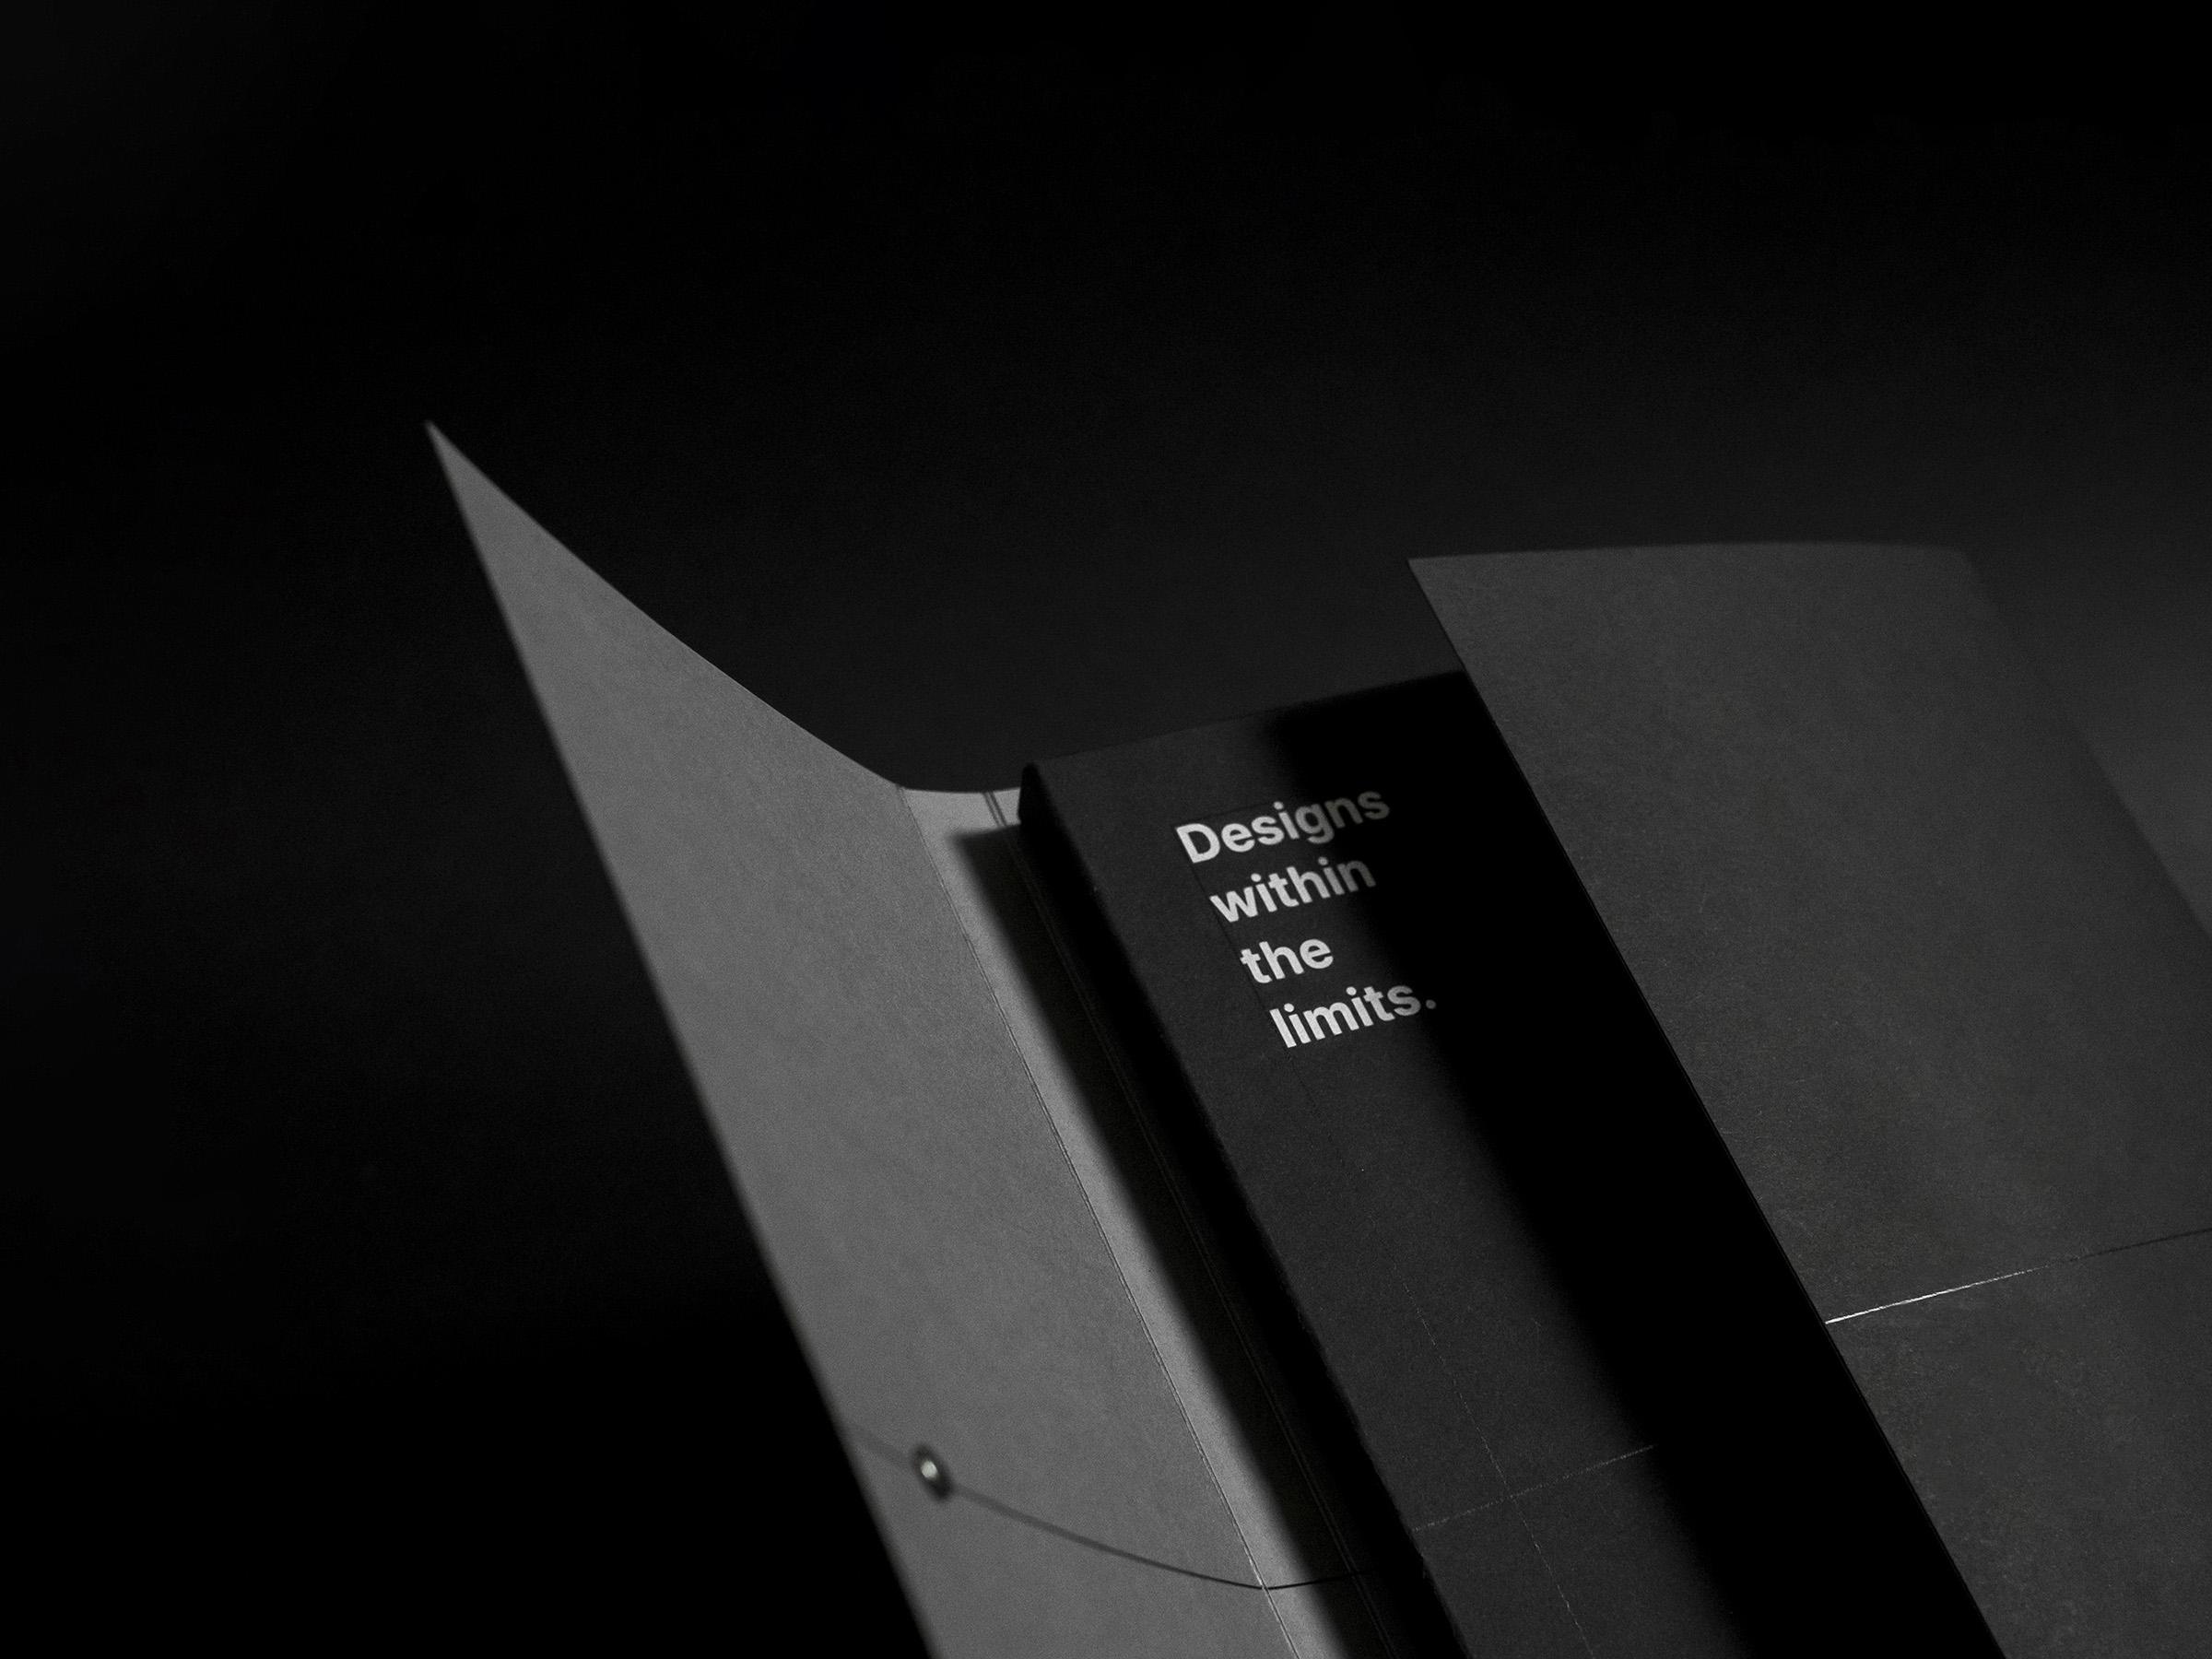 Designs Within the Limits Portfolio 2021